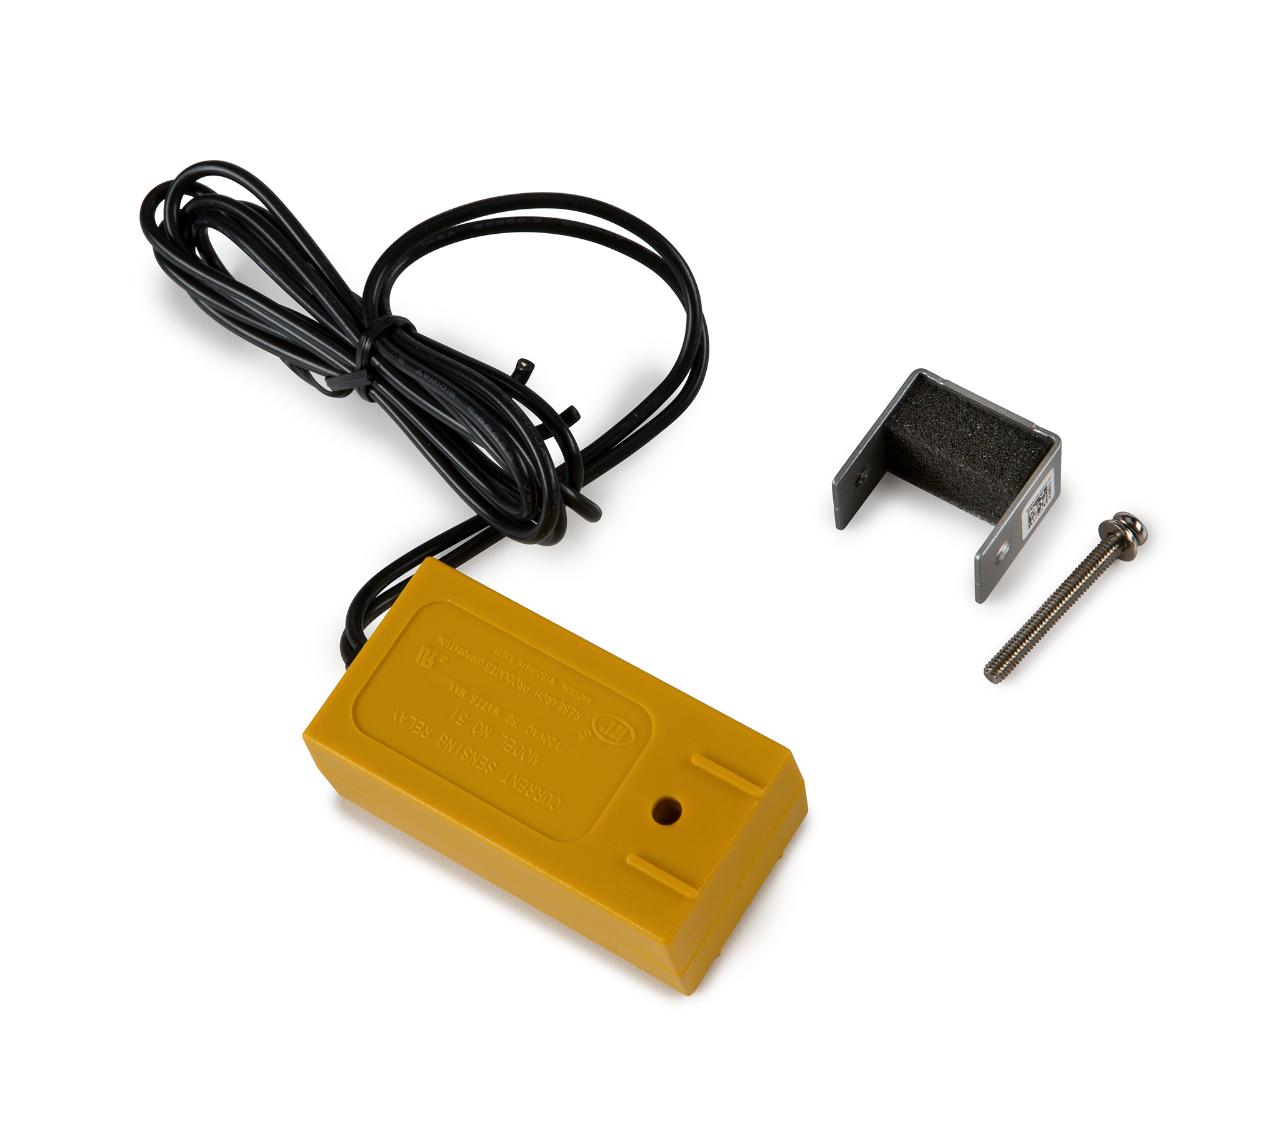 Aprilaire Current Sensing Relay (24 V Application) 2172112